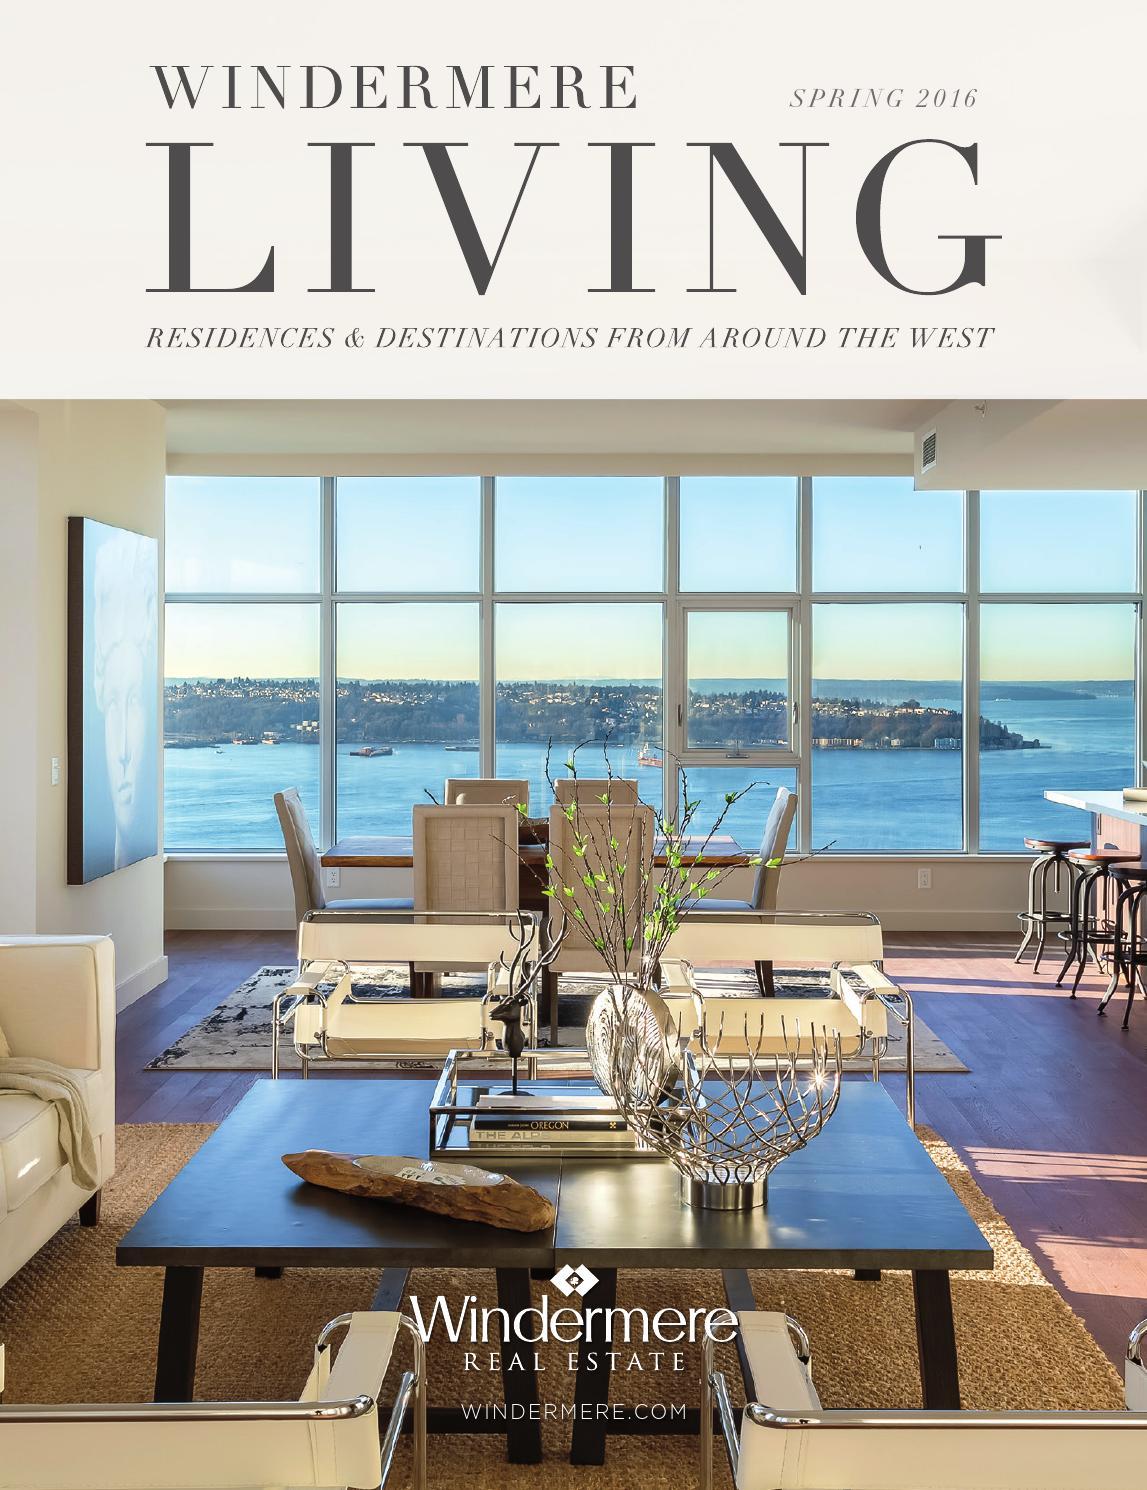 Windermere Living Spring 2016 by Windermere Real Estate - issuu